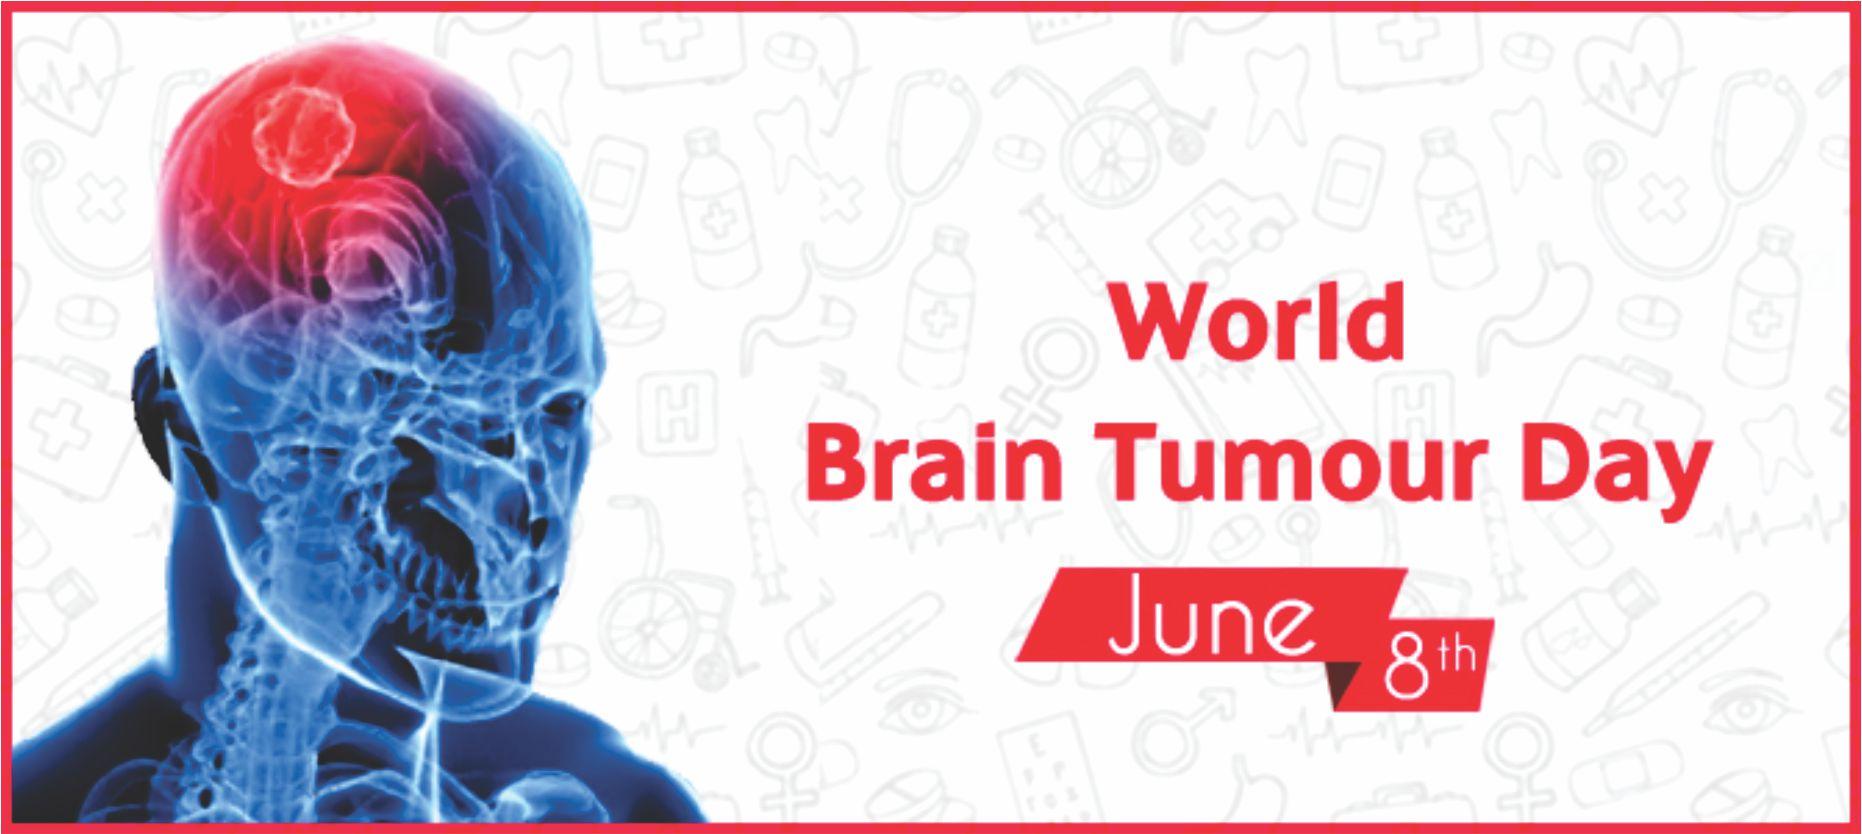 June 8th is World Brain Tumor Day